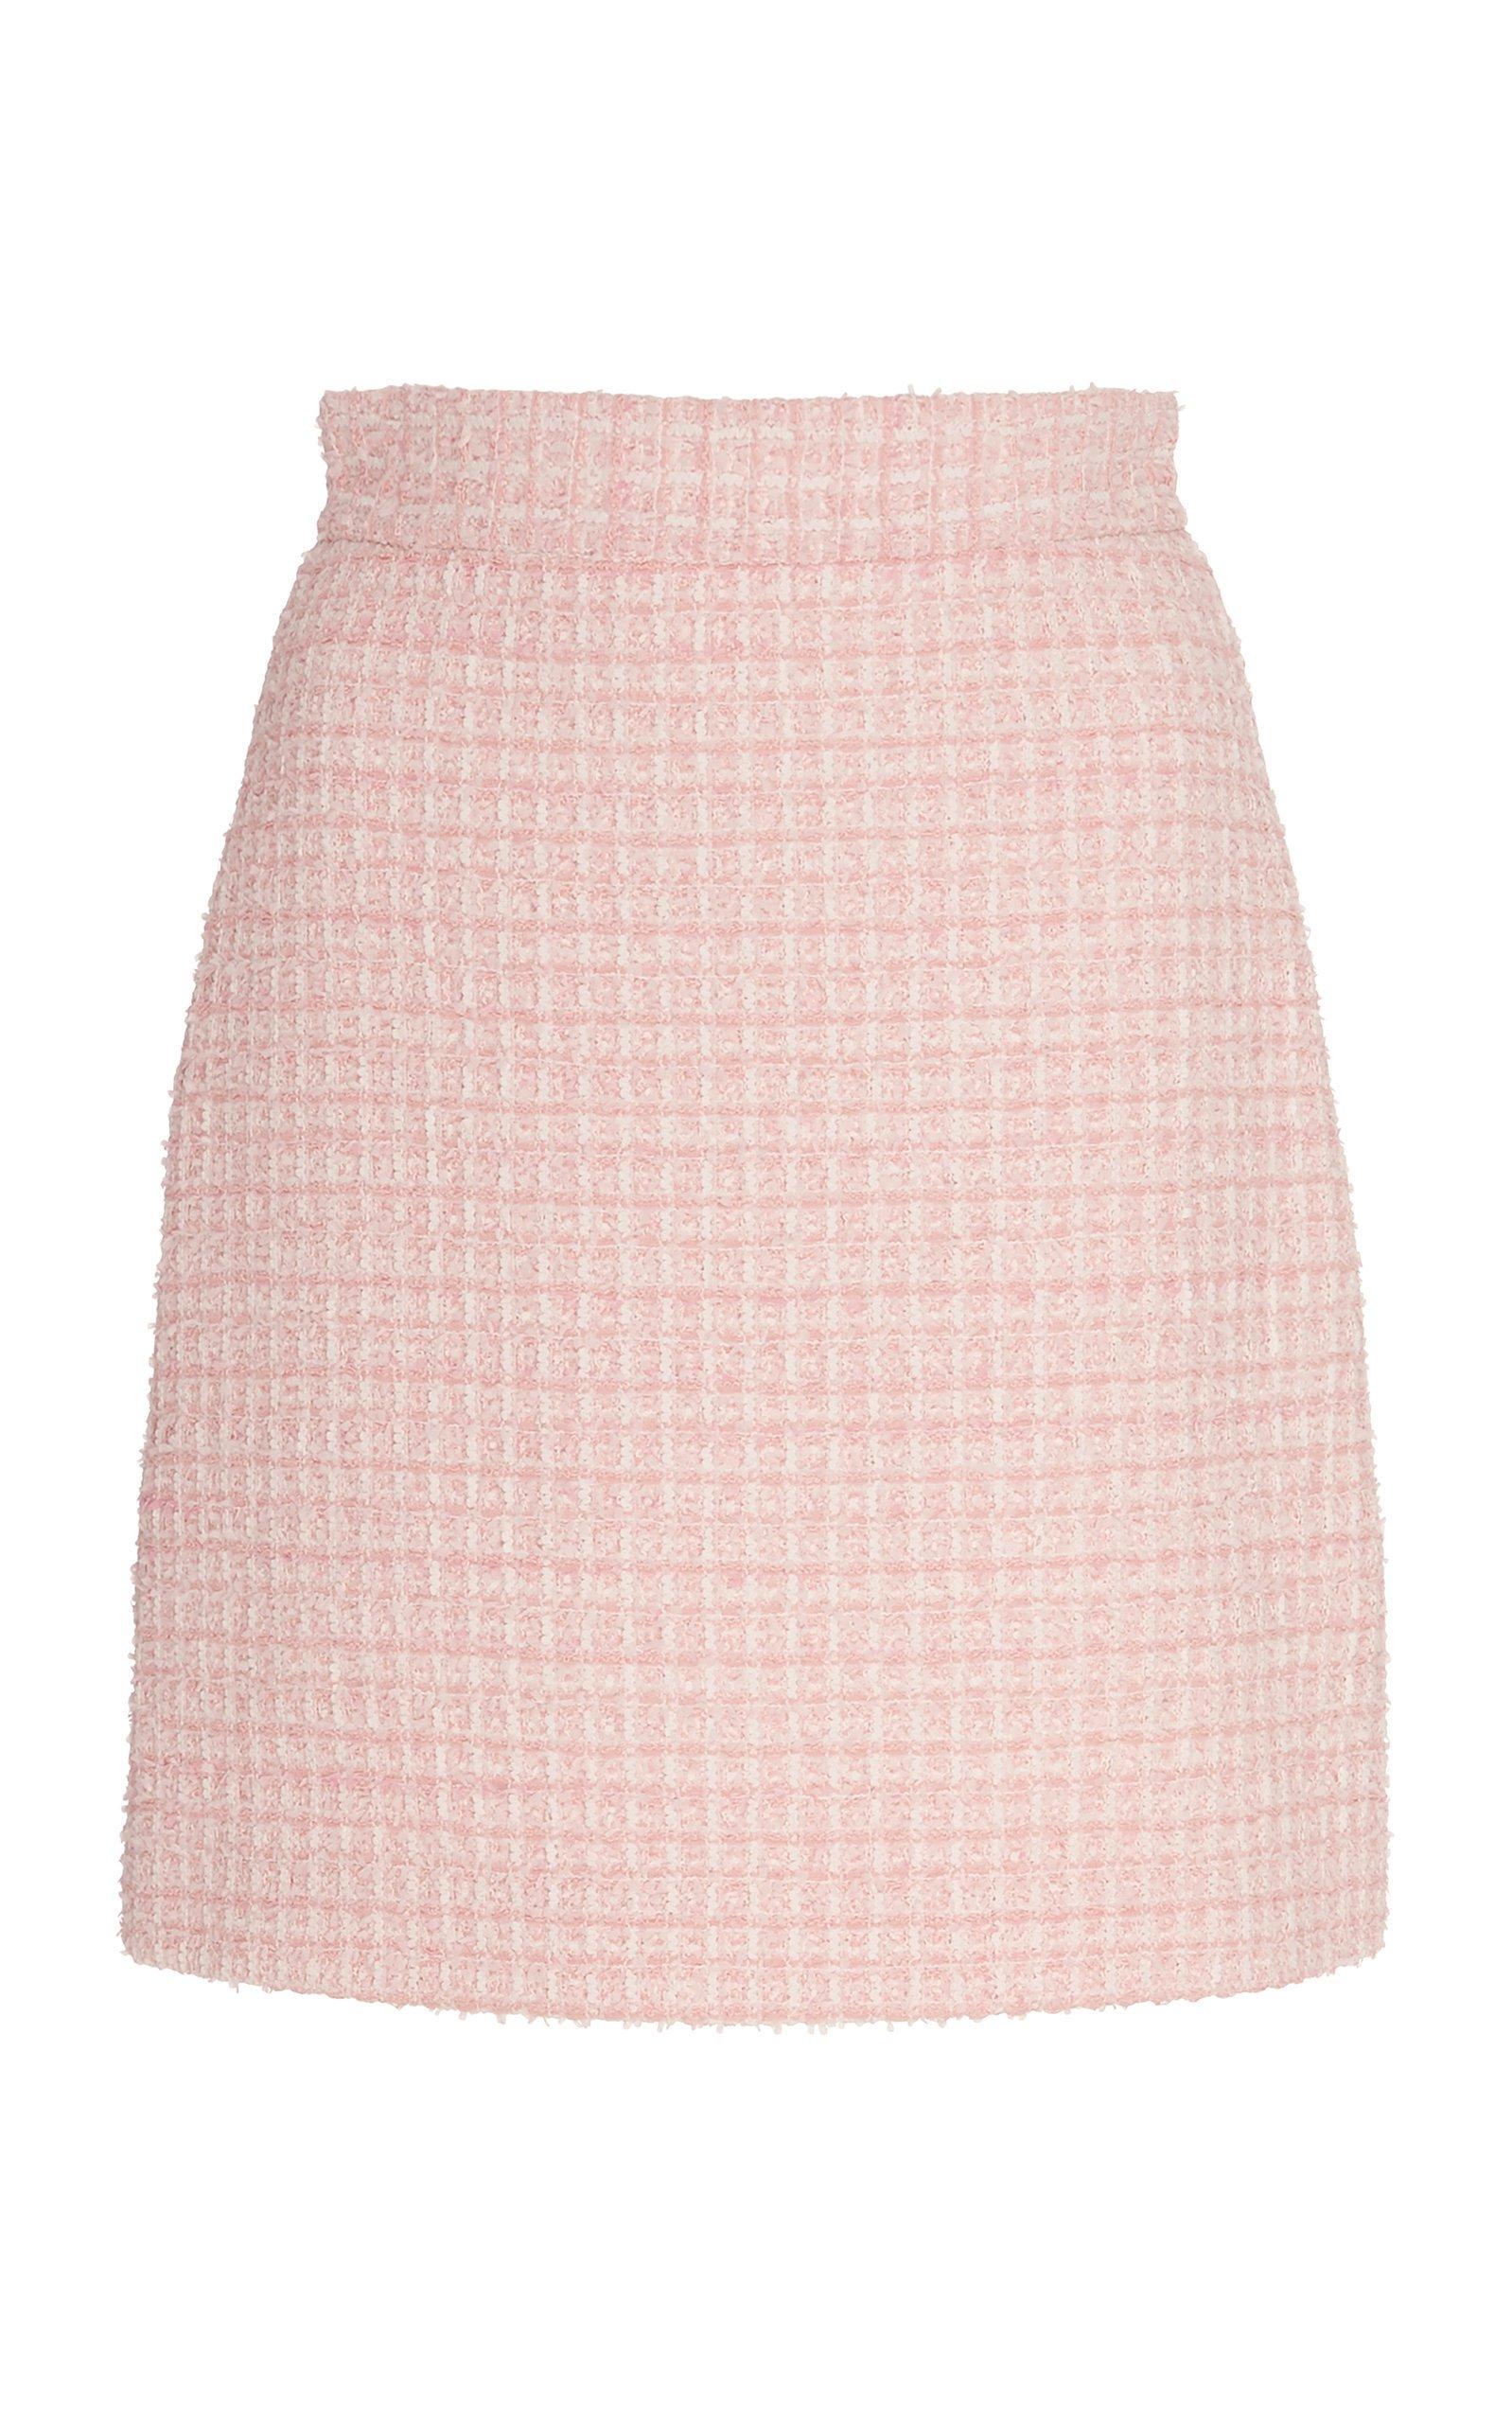 SOONIL Pink Tweed Mini Skirt Size: 12